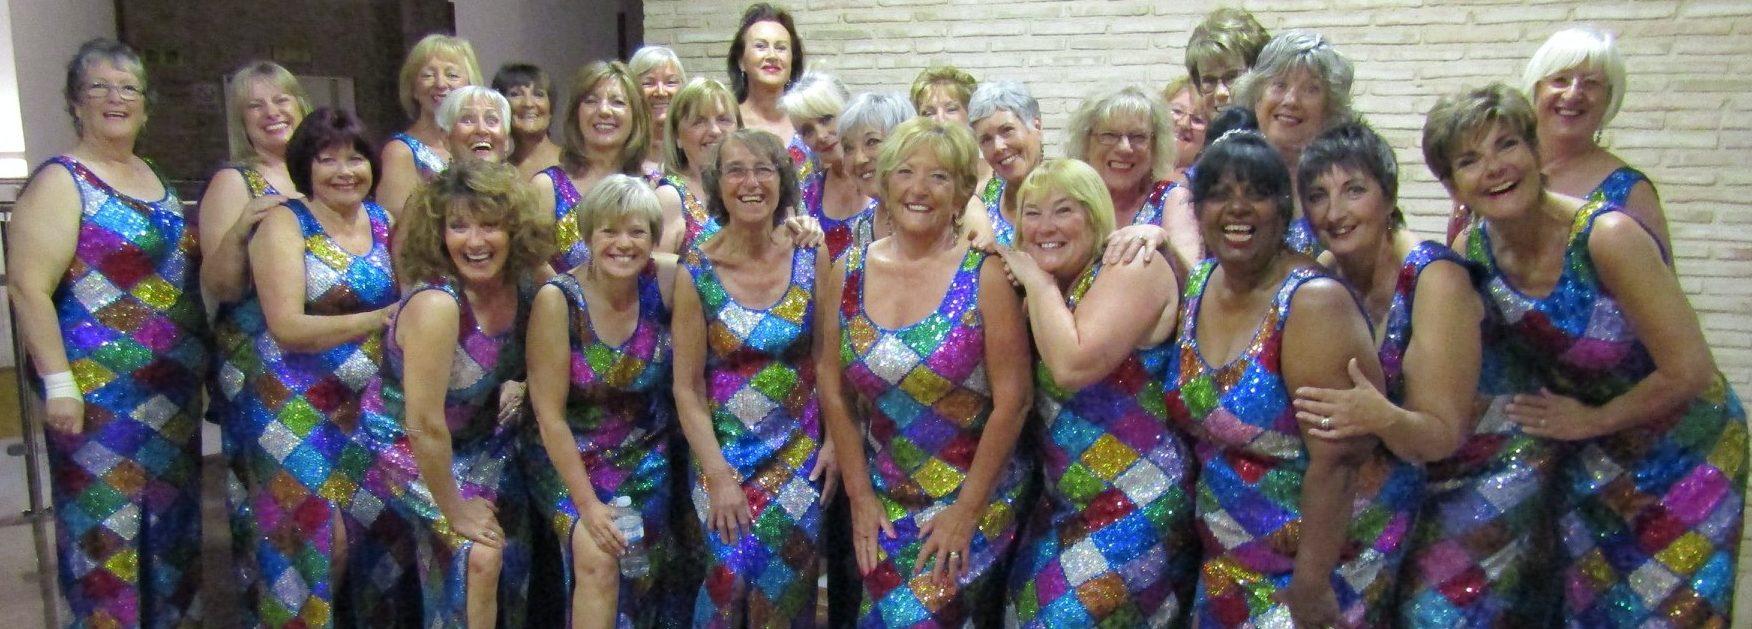 Spangles Ladies' Harmony Chorus